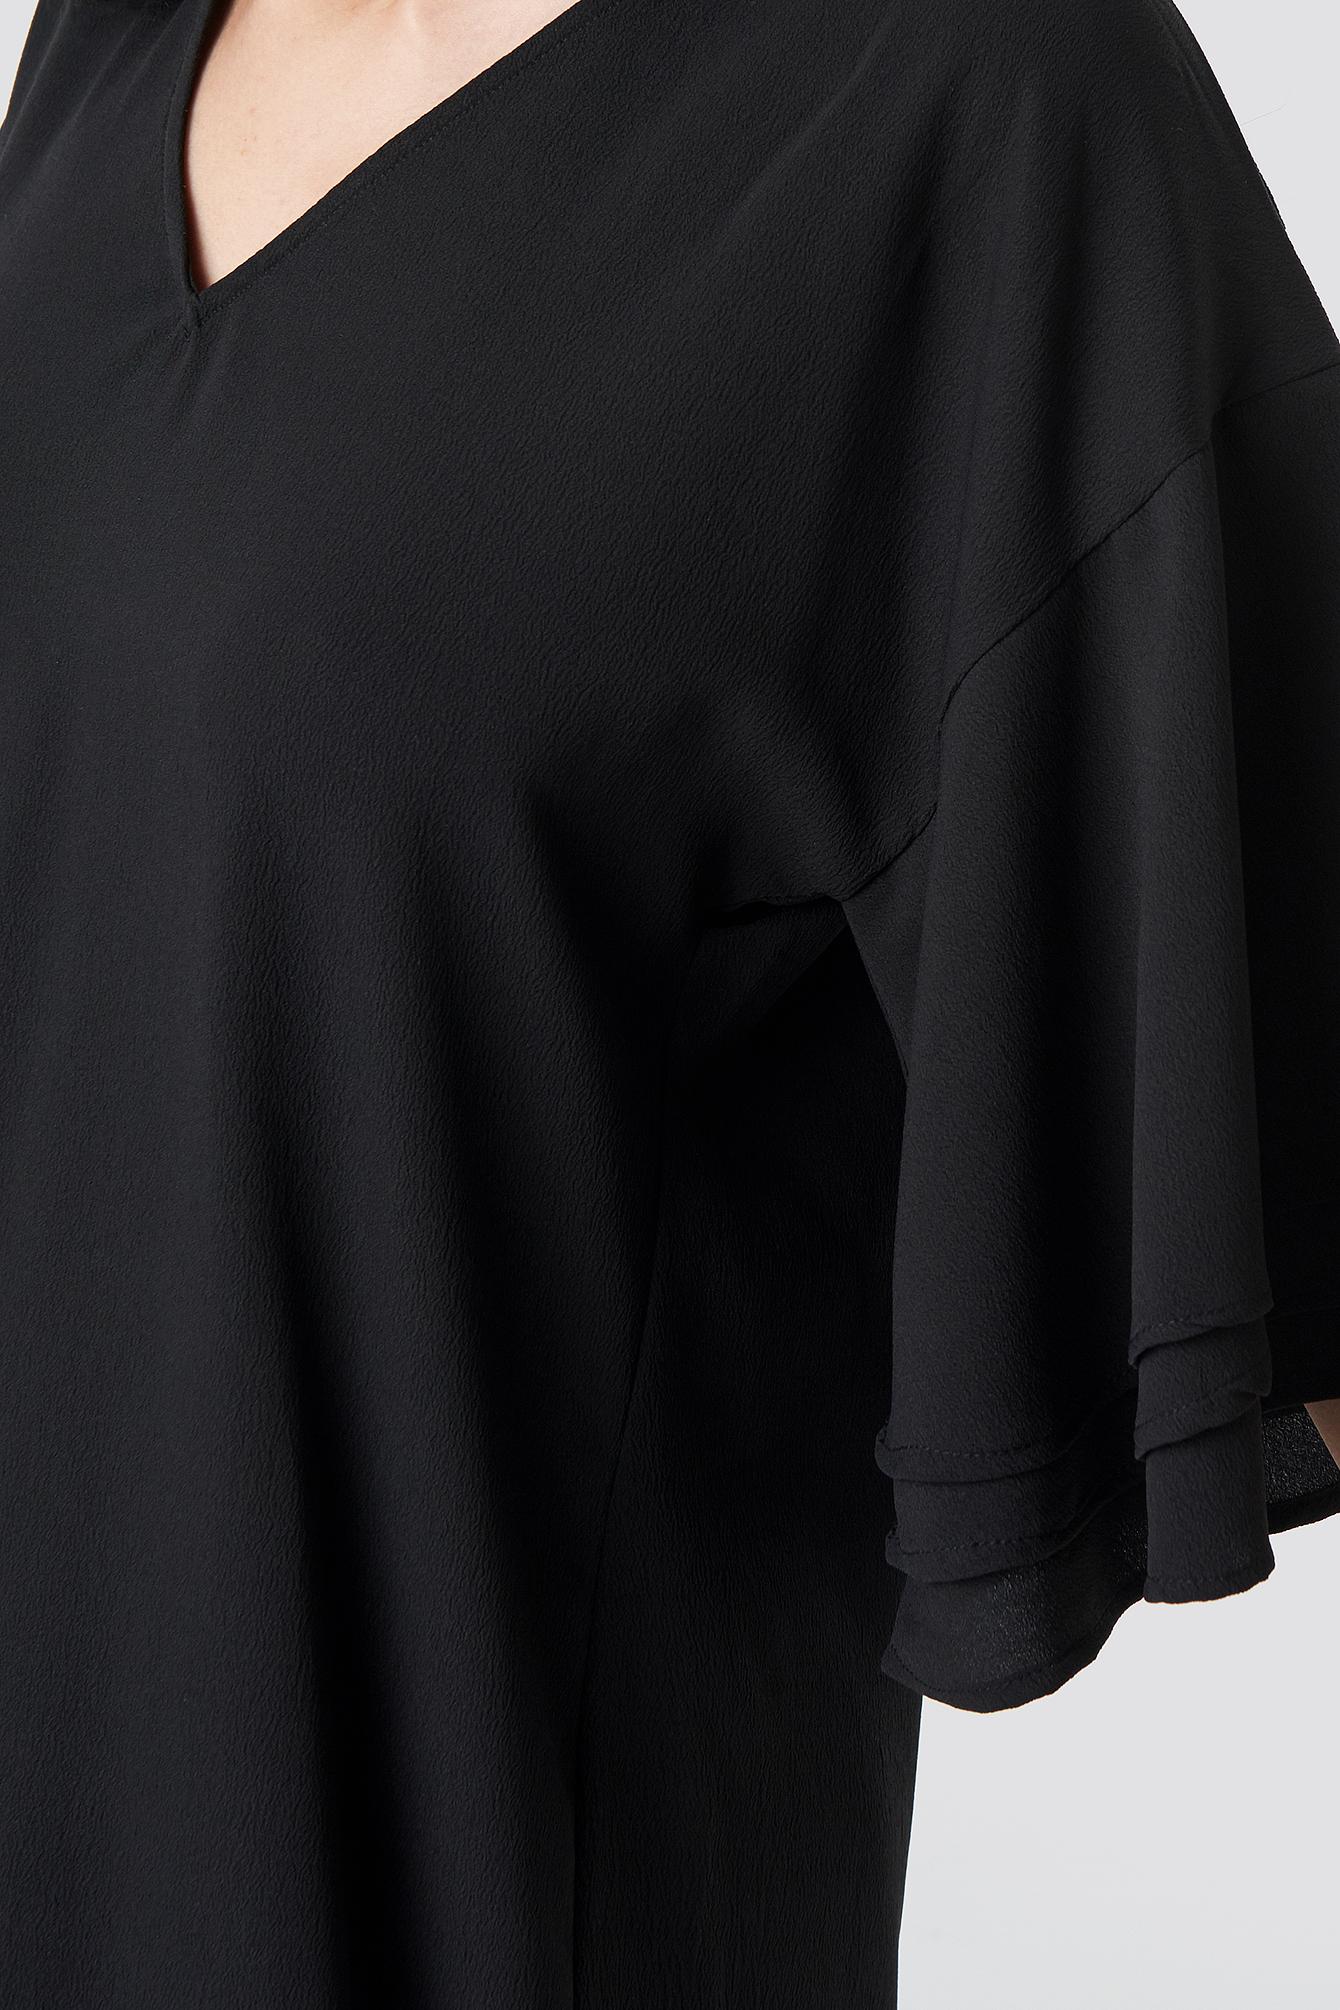 V-neck Layered Sleeve Dress NA-KD.COM